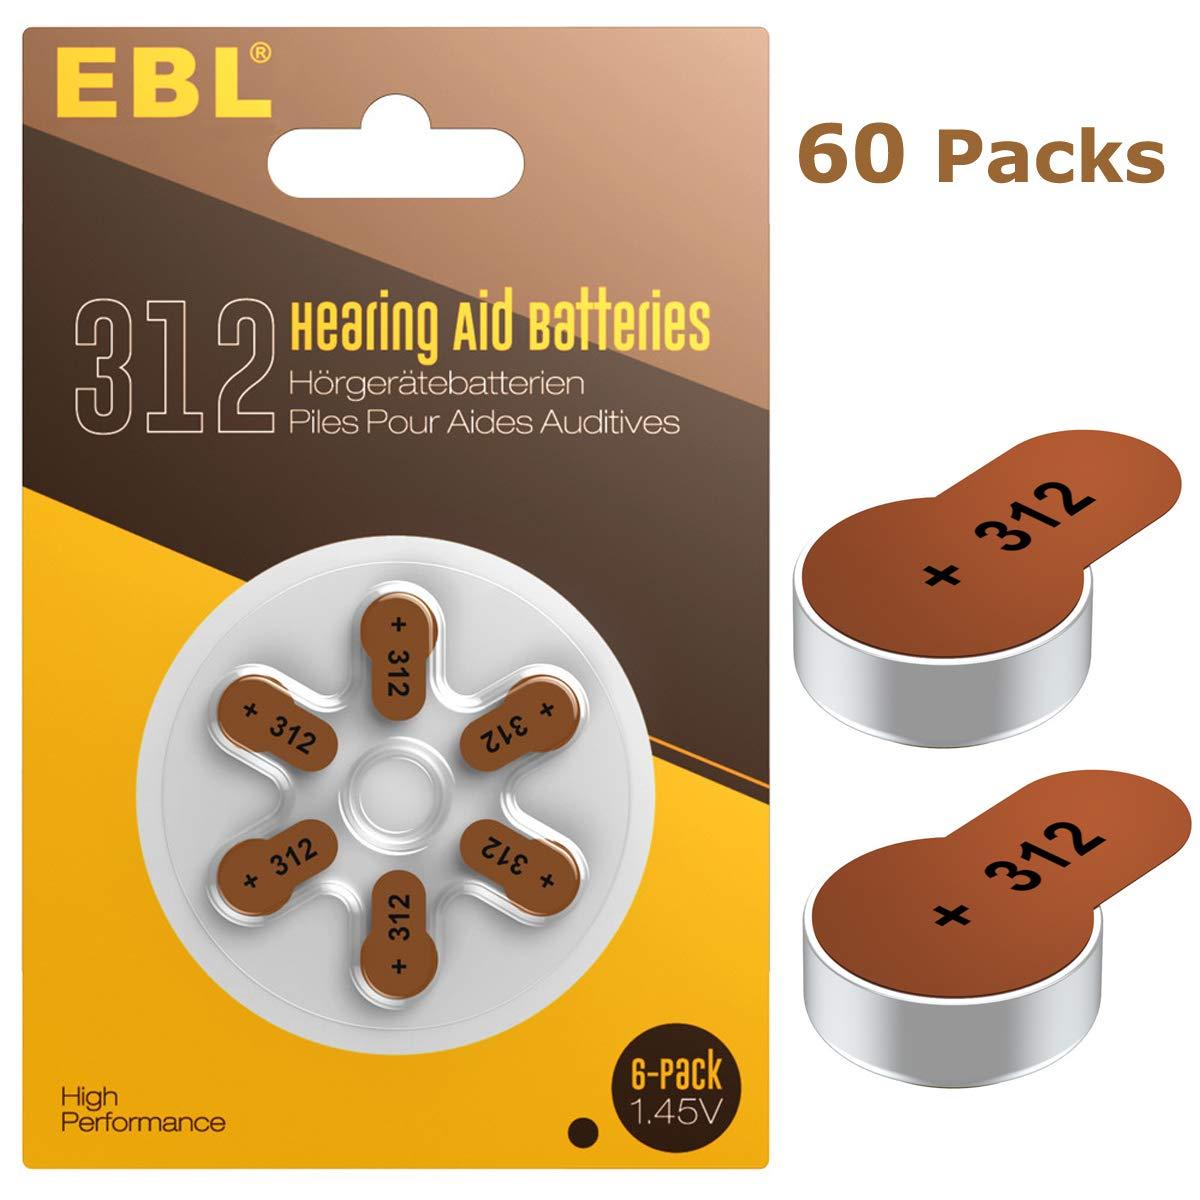 EBL Hearing Aid Batteries Size 312 PR41 60 Pack 1.45V Zinc-Air Battery by EBL